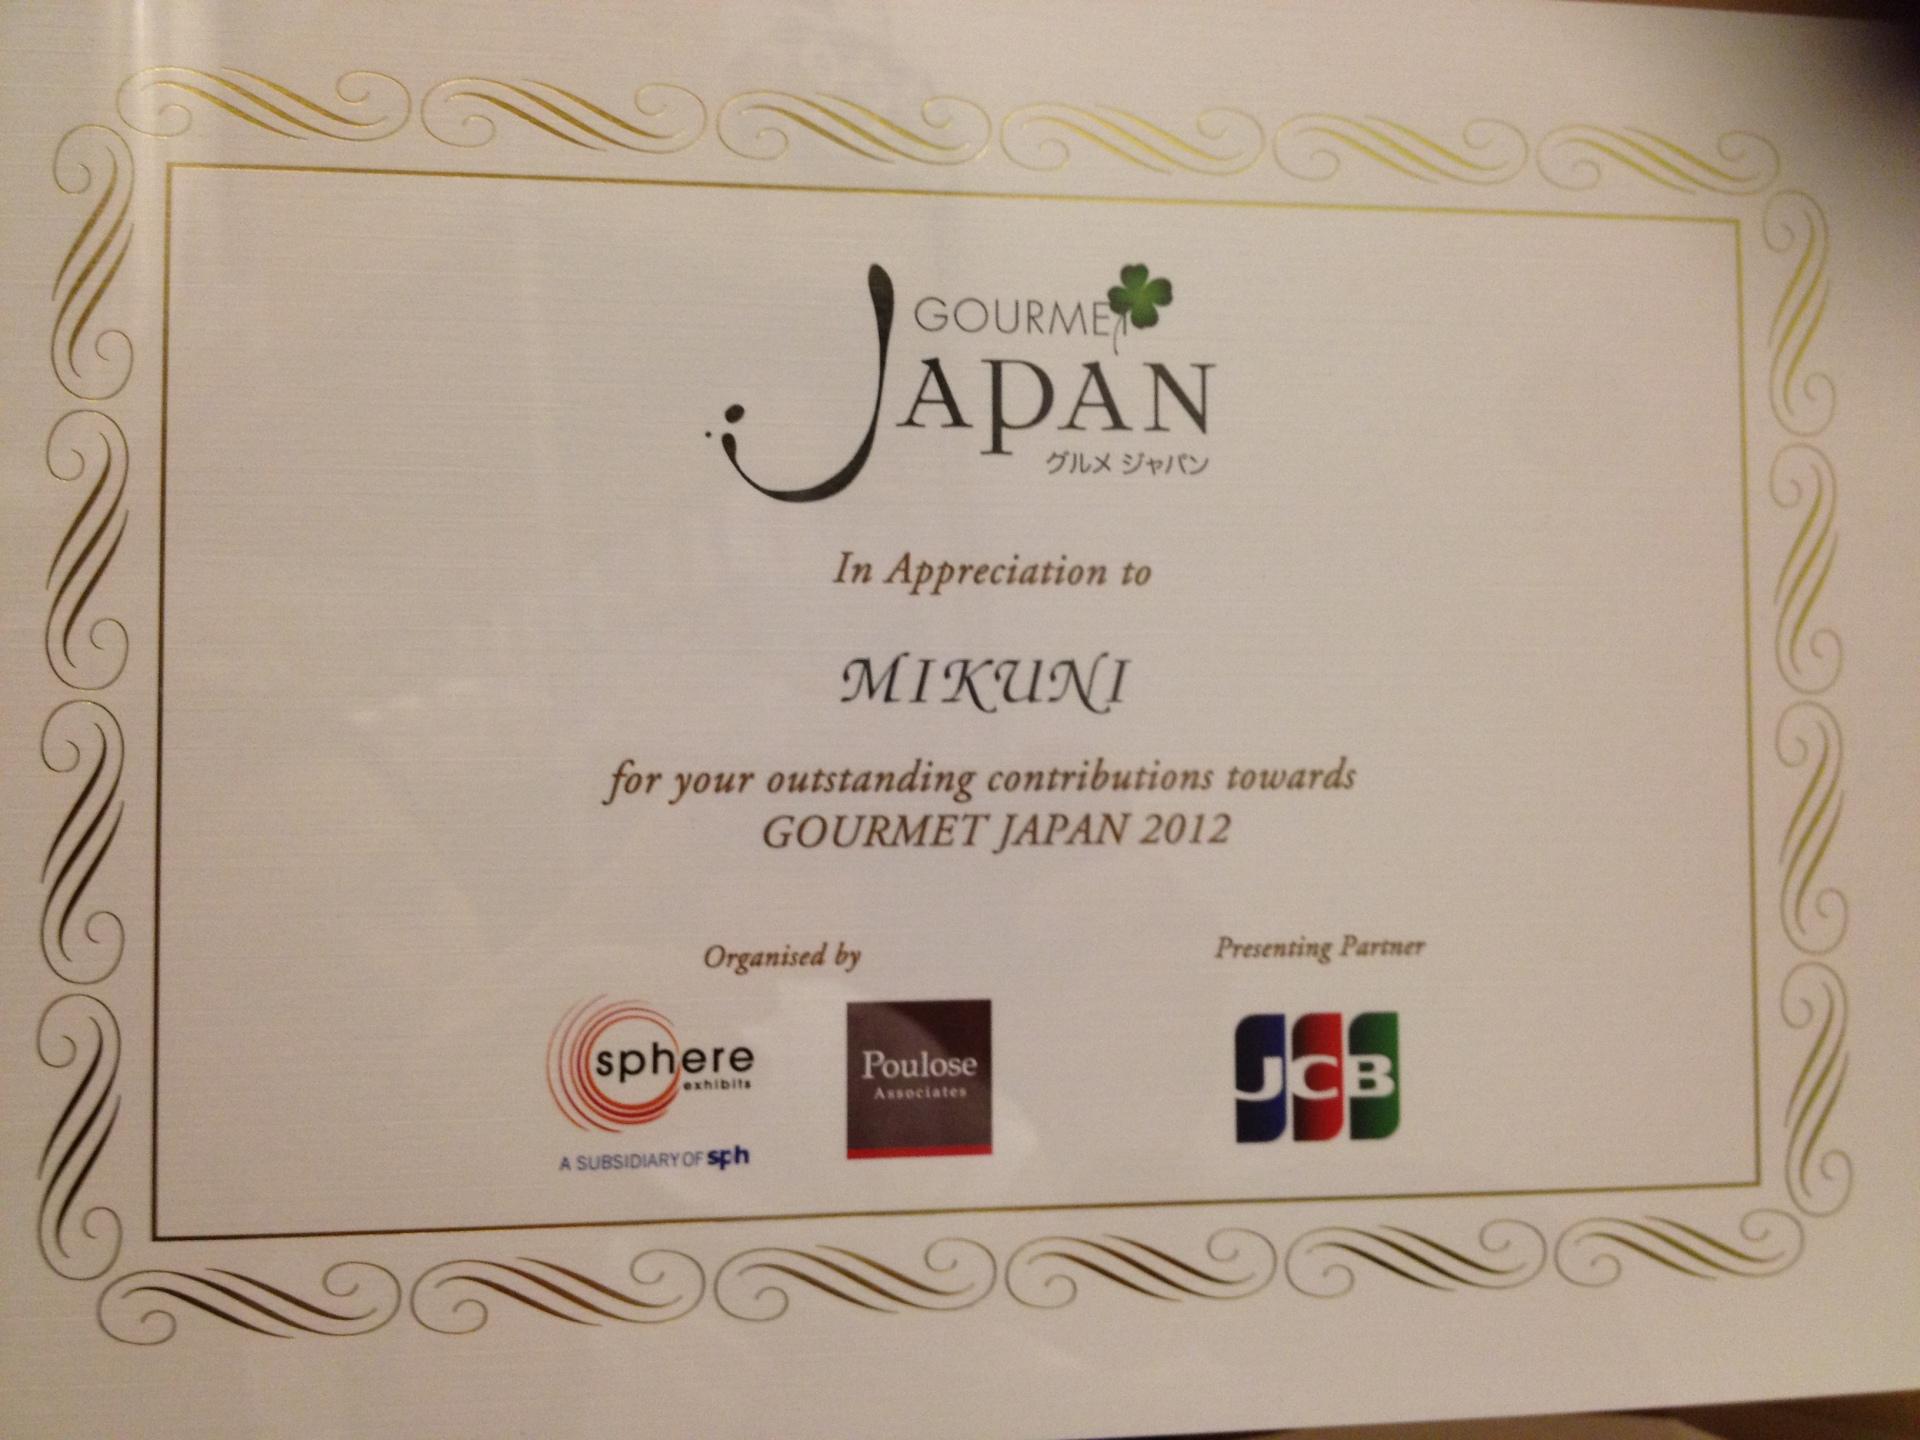 Gourmet JAPAN